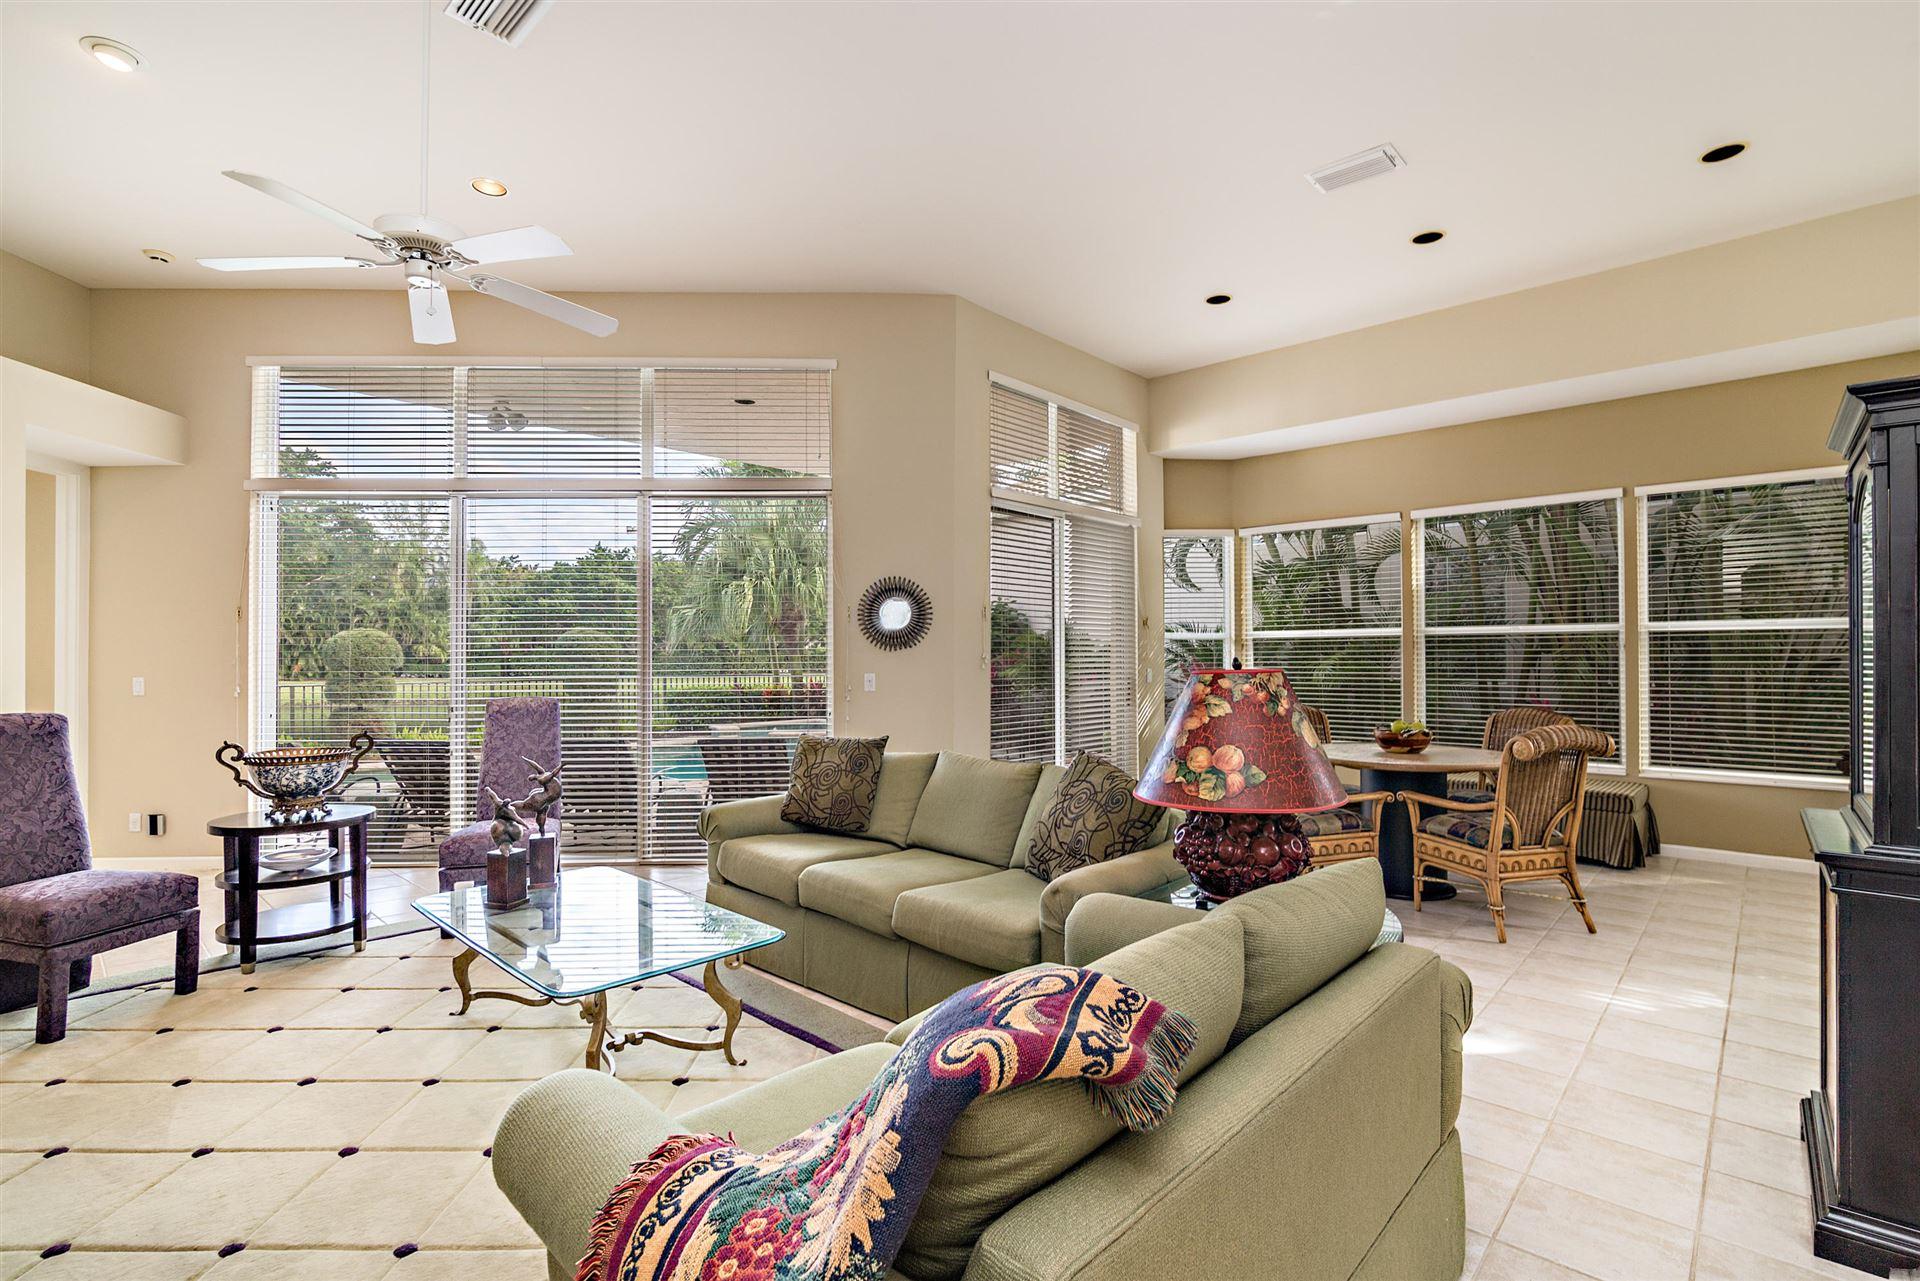 Photo of 319 Sunset Bay Lane, Palm Beach Gardens, FL 33418 (MLS # RX-10656742)